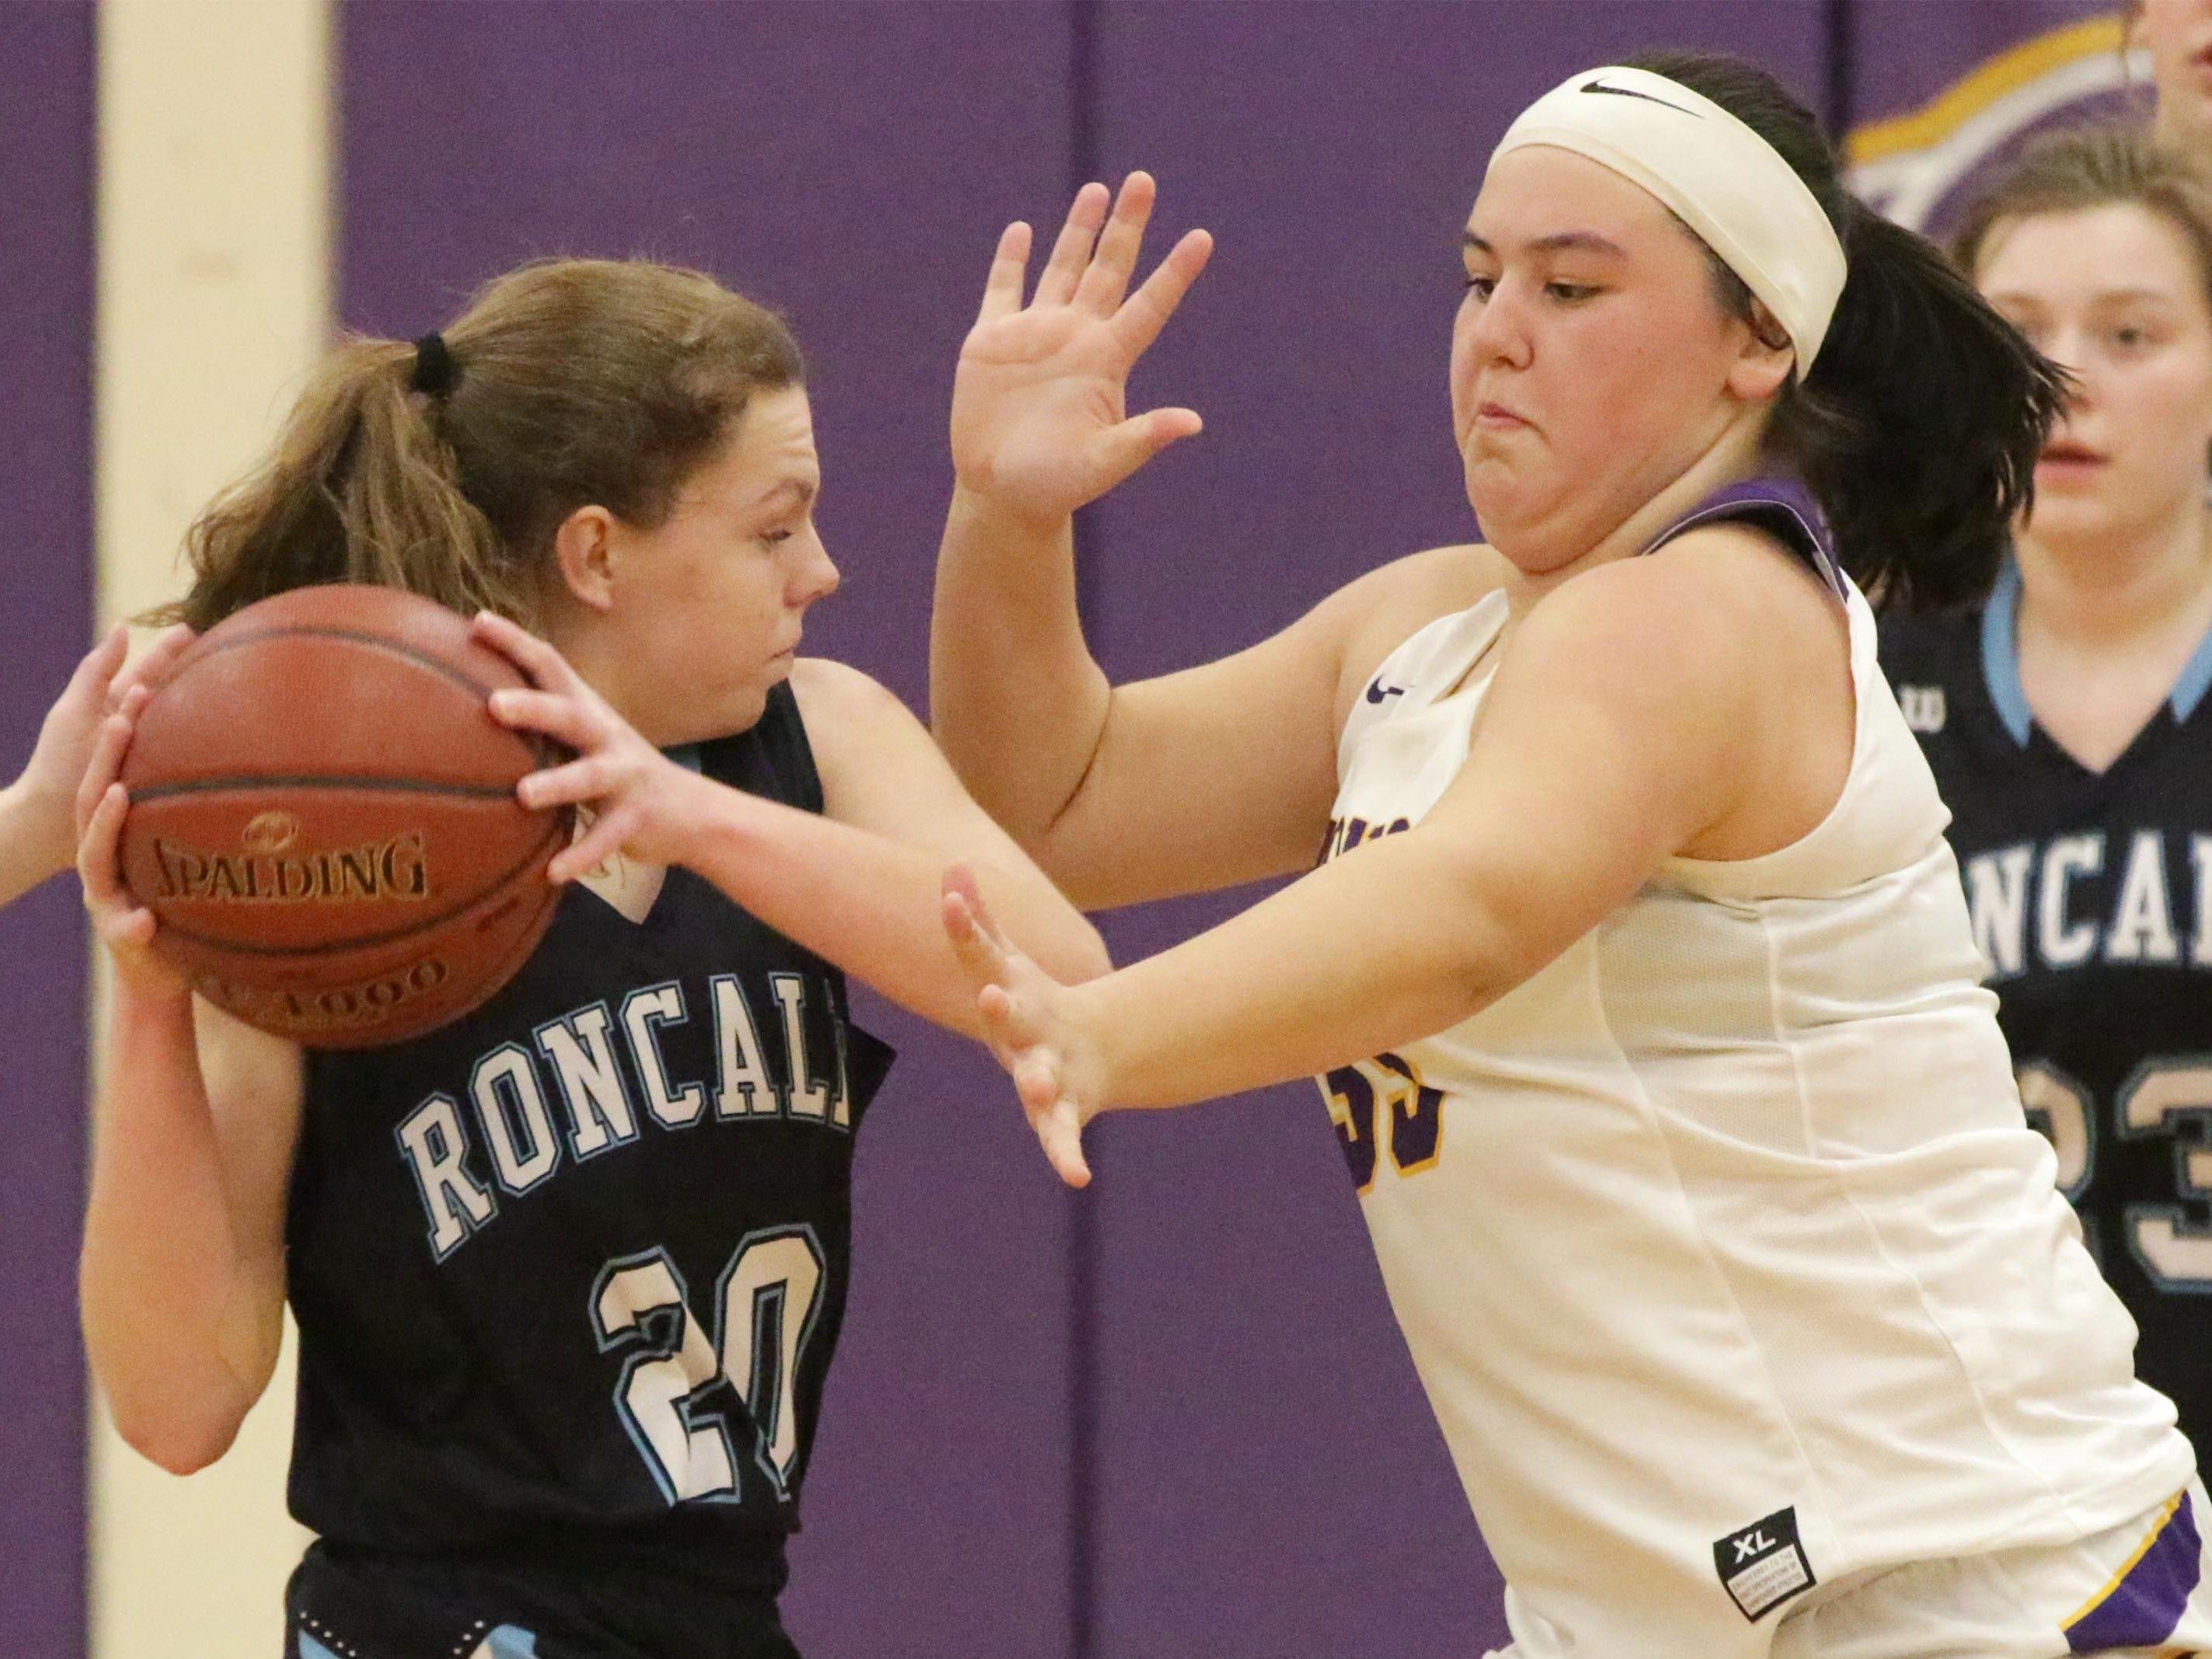 Roncalli's Gonna Schramm (20) looks to pass the ball by Sheboygan Falls' Jordyn Girdaukas (35), Friday, January 25, 2019, in Sheboygan Falls, Wis.